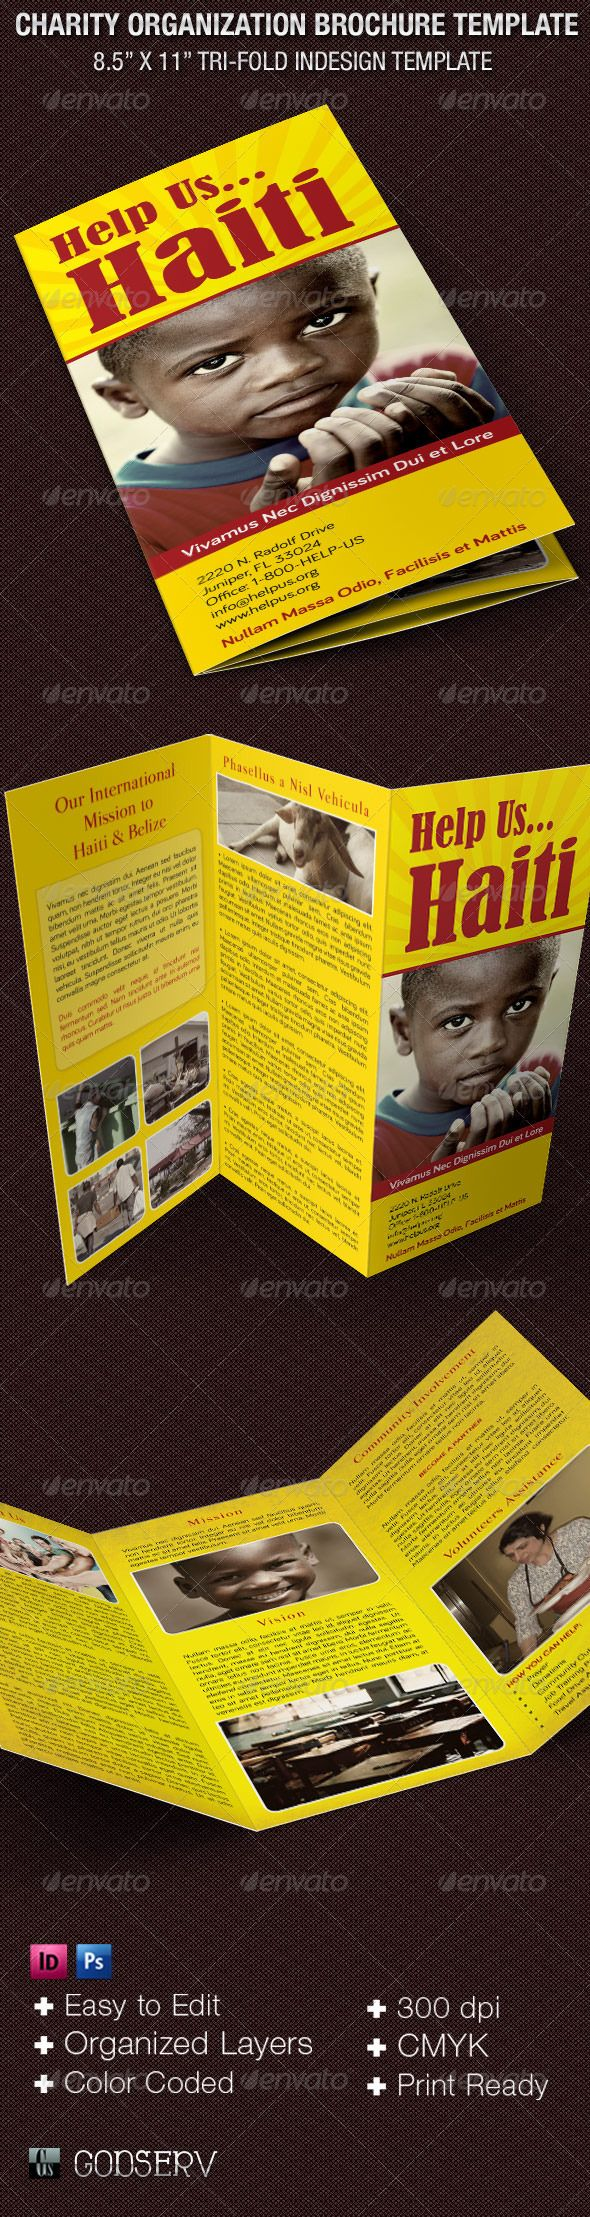 Charity Organization Brochure Template - Informational Brochures